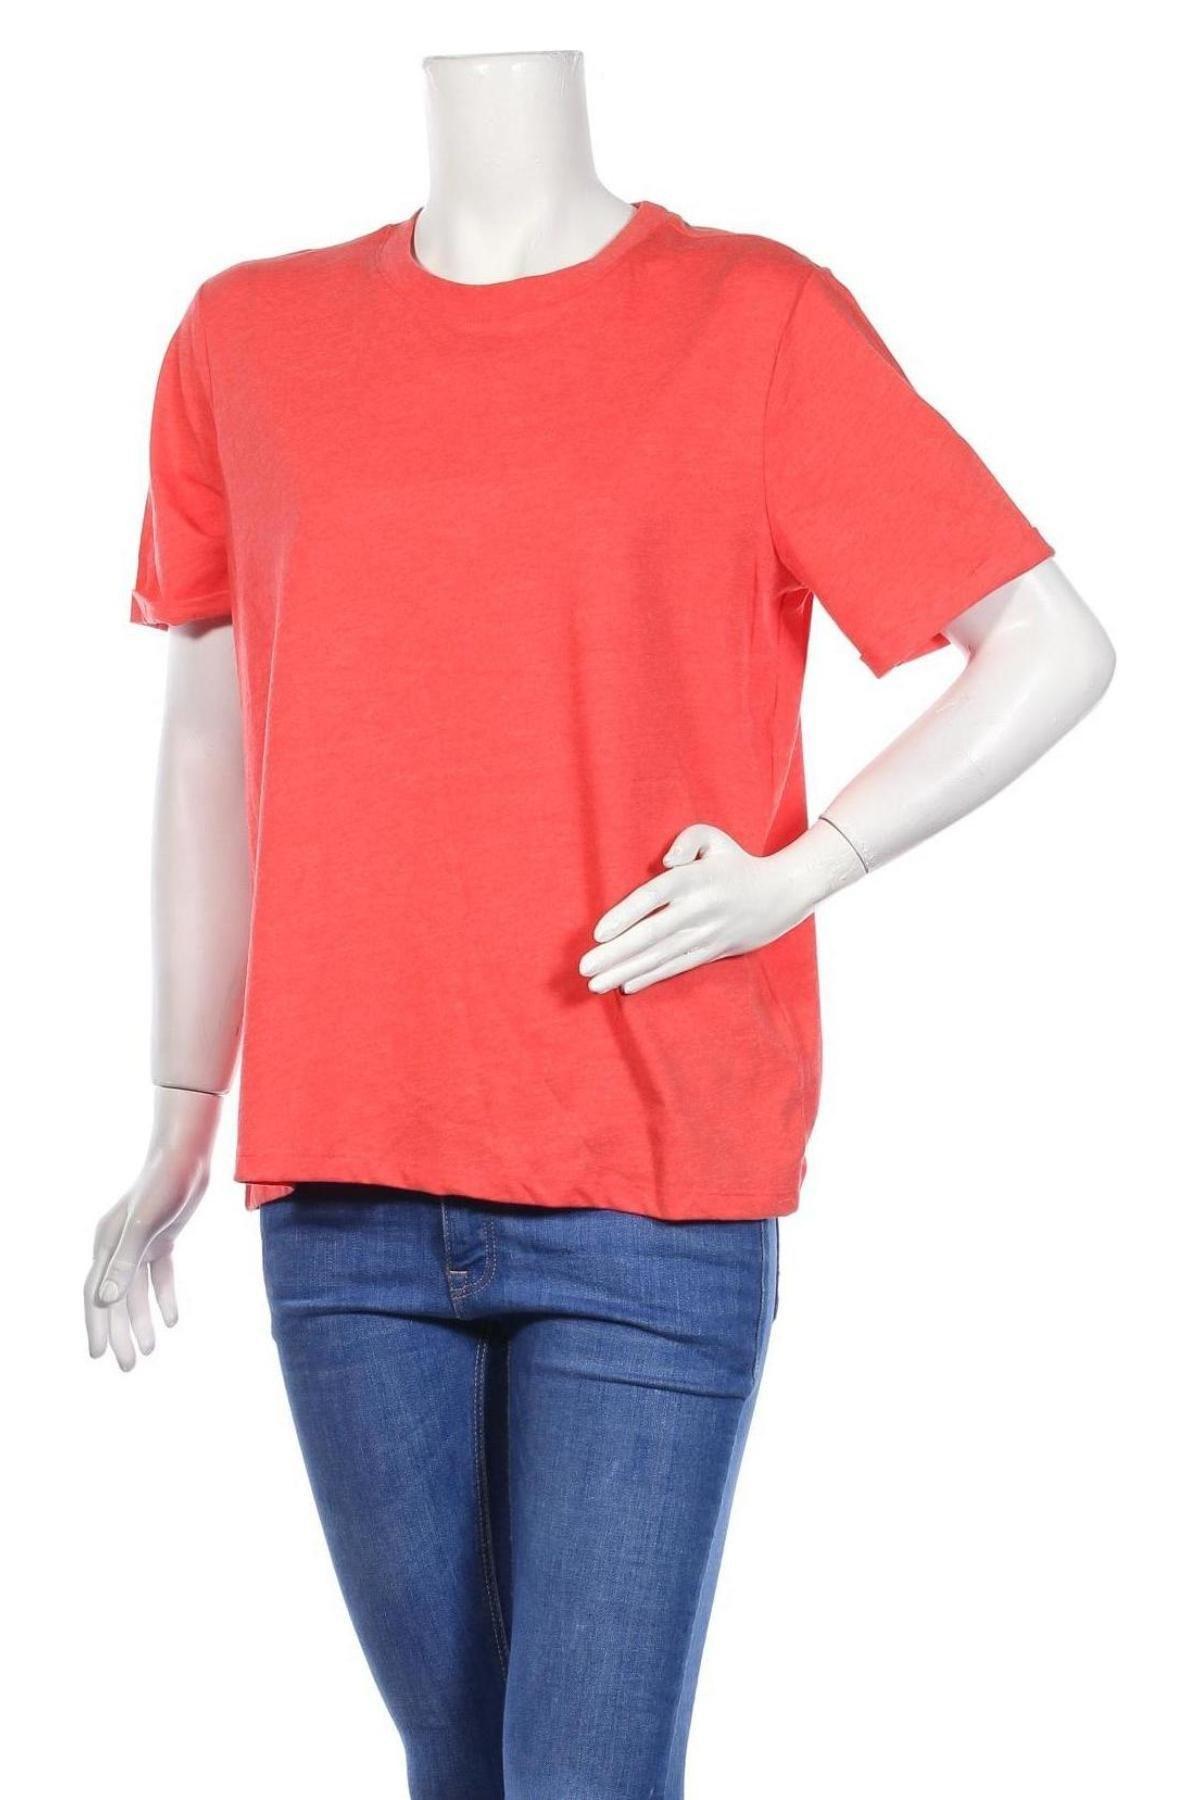 Дамска тениска Pieces, Размер XL, Цвят Оранжев, 50% памук, 50% полиестер, Цена 15,95лв.